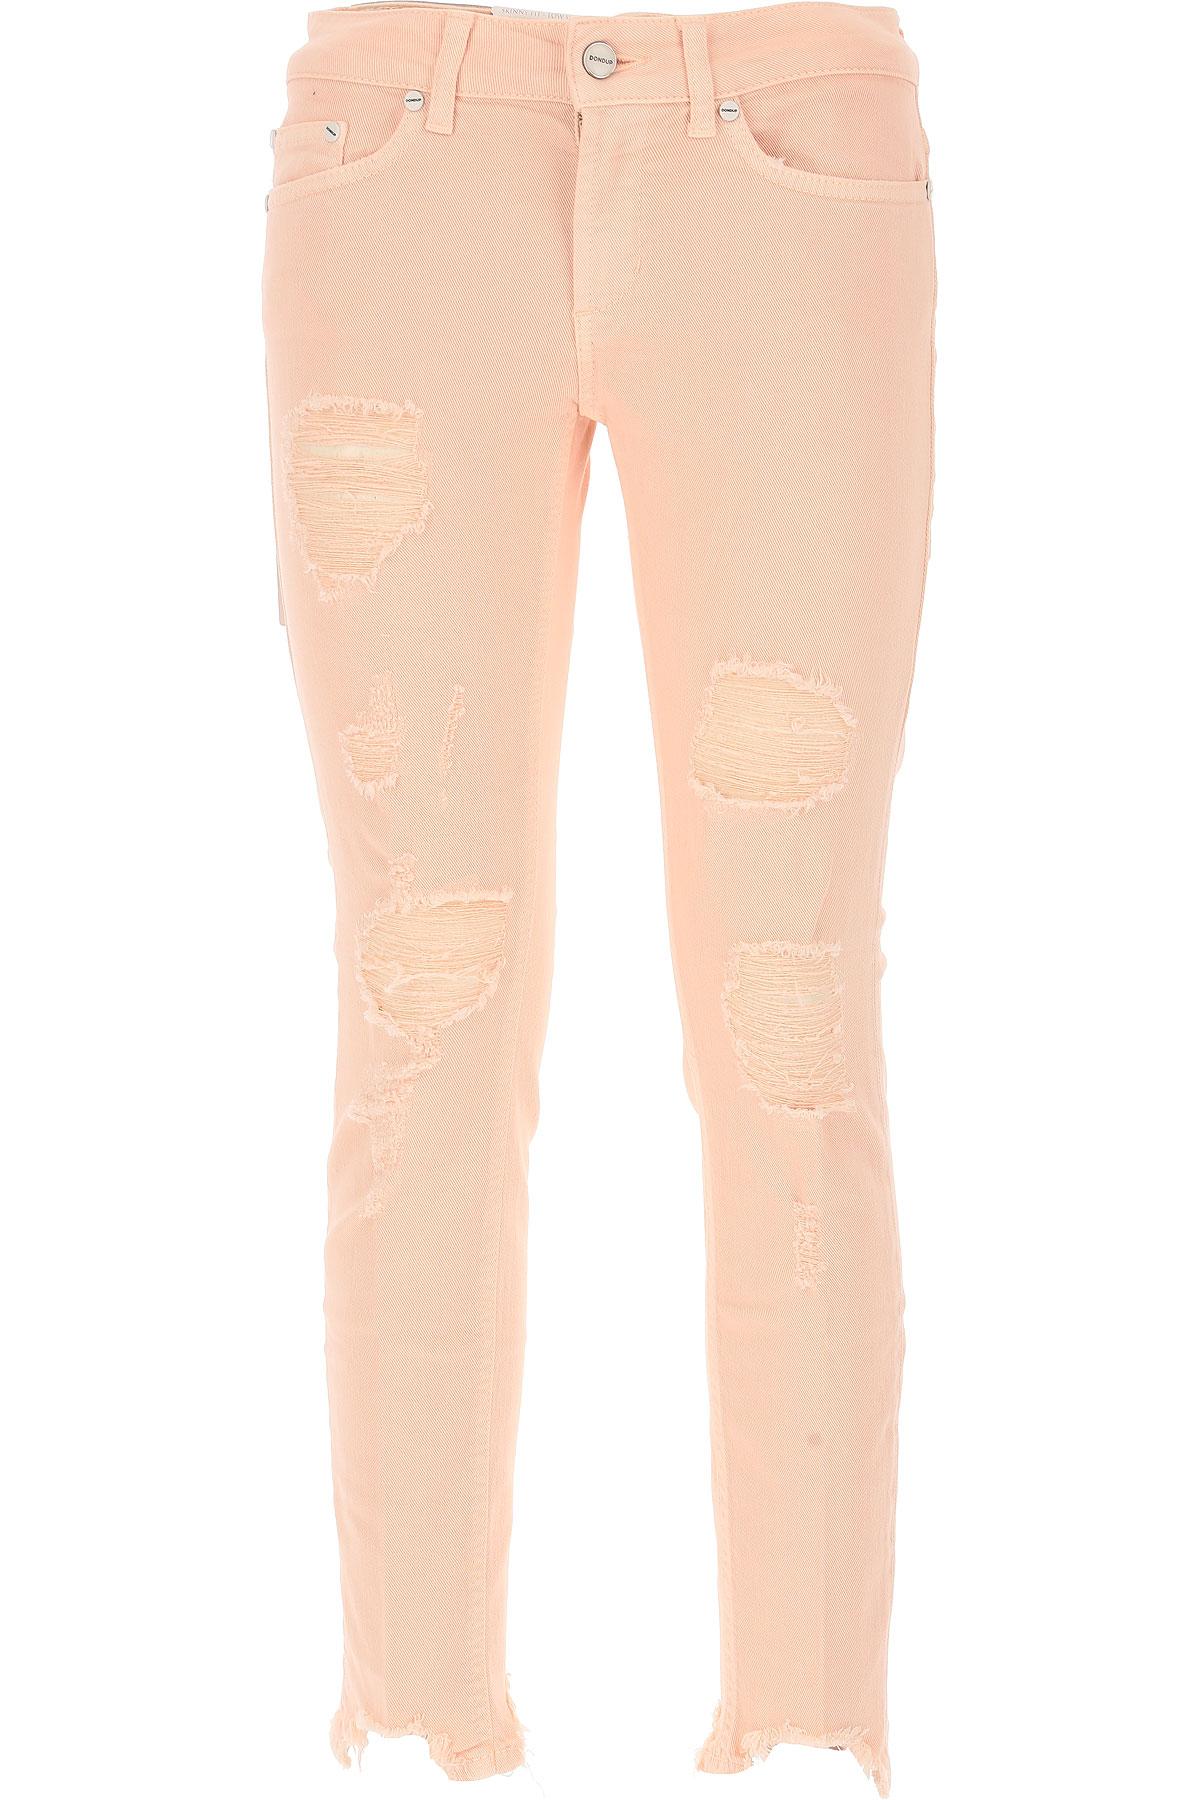 Dondup Jeans On Sale, Salmon Pink, Cotton, 2017, 26 27 28 29